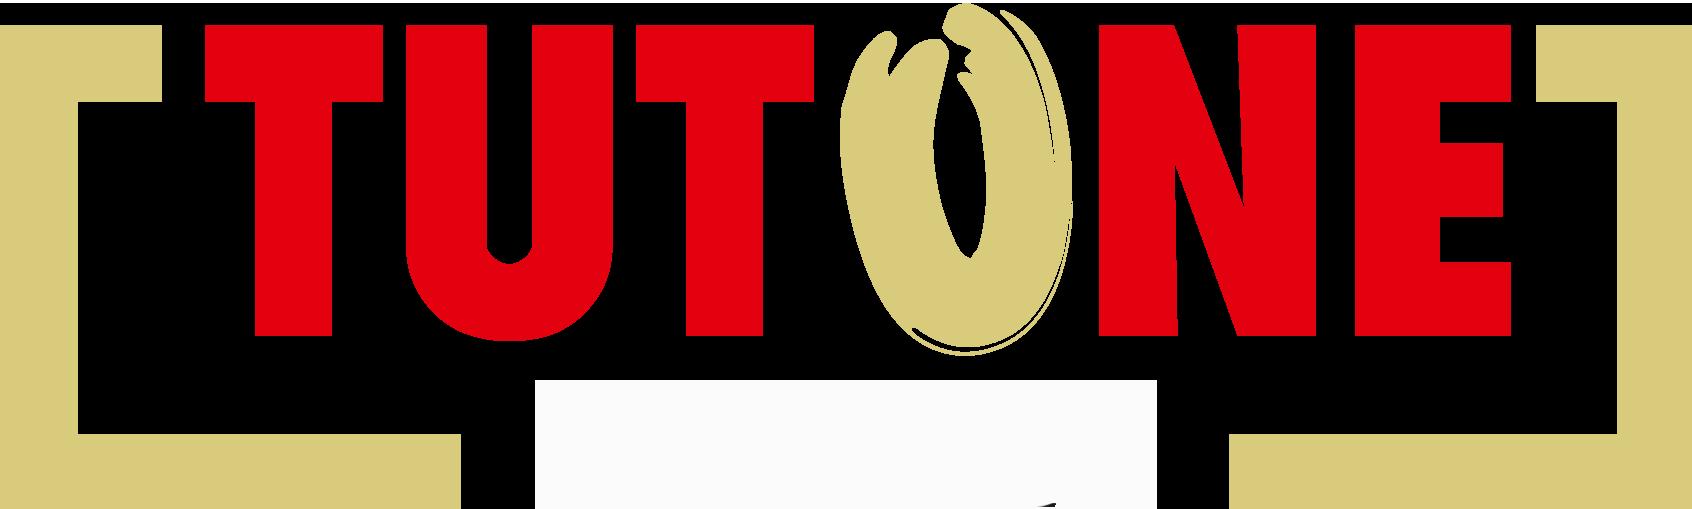 TUTONE ANICE UNICO